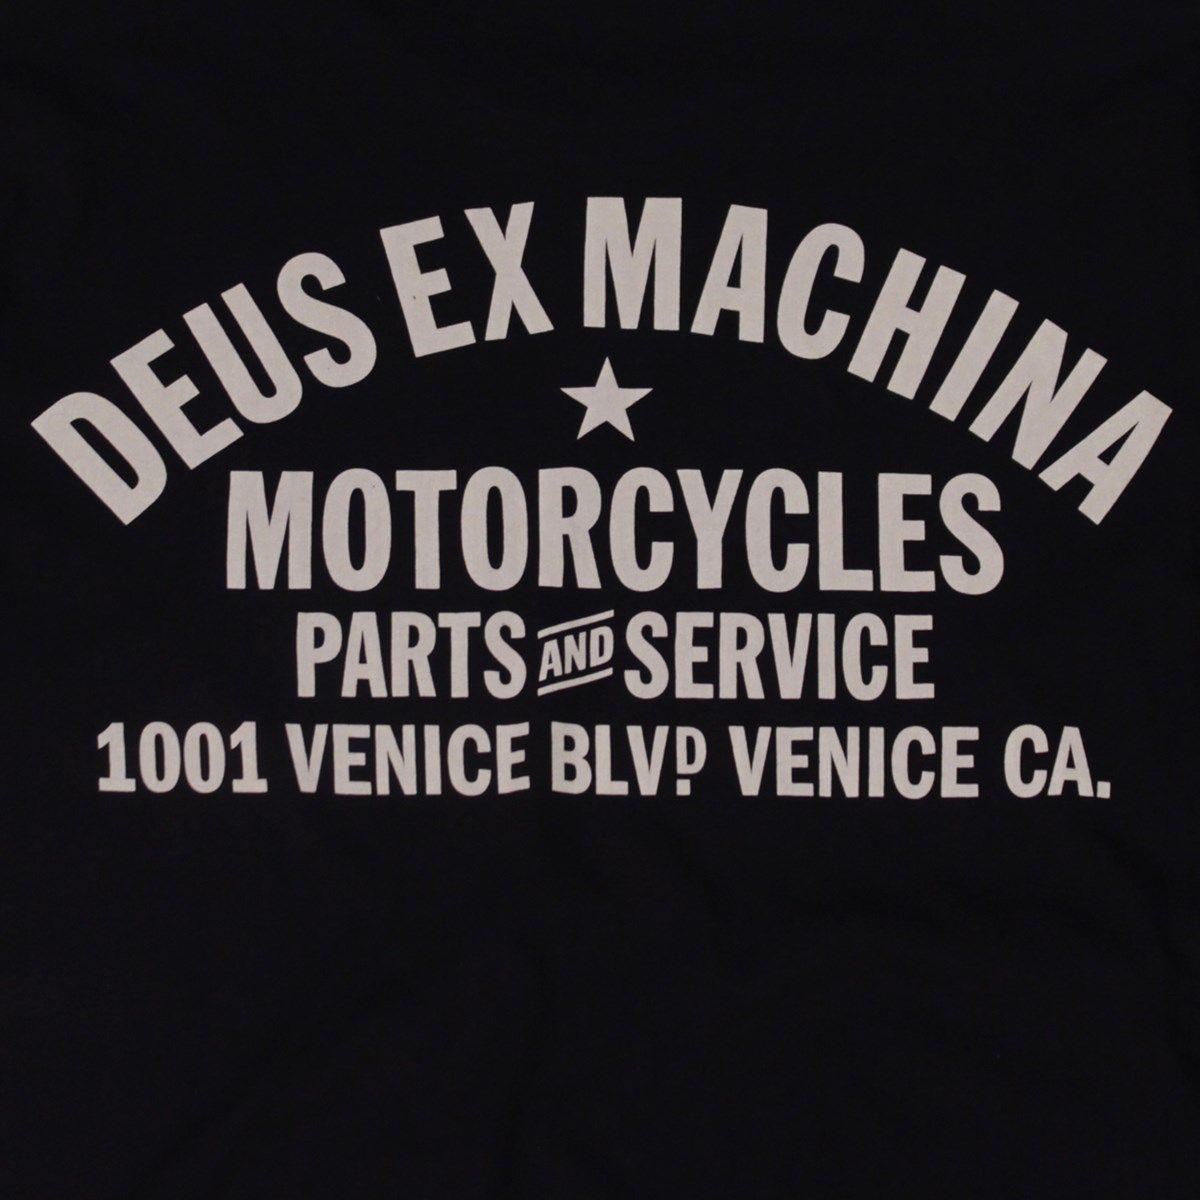 Deus Ex Machina Logo Google Search Vintages Pinterest Premium Catur Original Automotive Logos